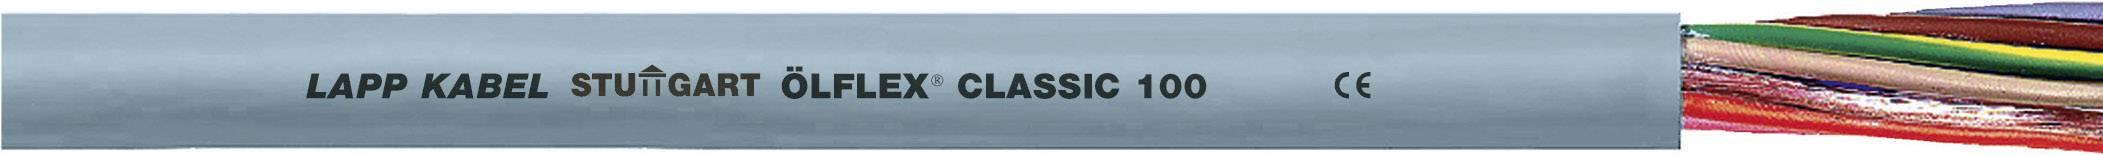 Kabel LappKabel Ölflex CLASSIC 100 7G1 (0010046), PVC, 8 mm, 500 V, šedá, 500 m